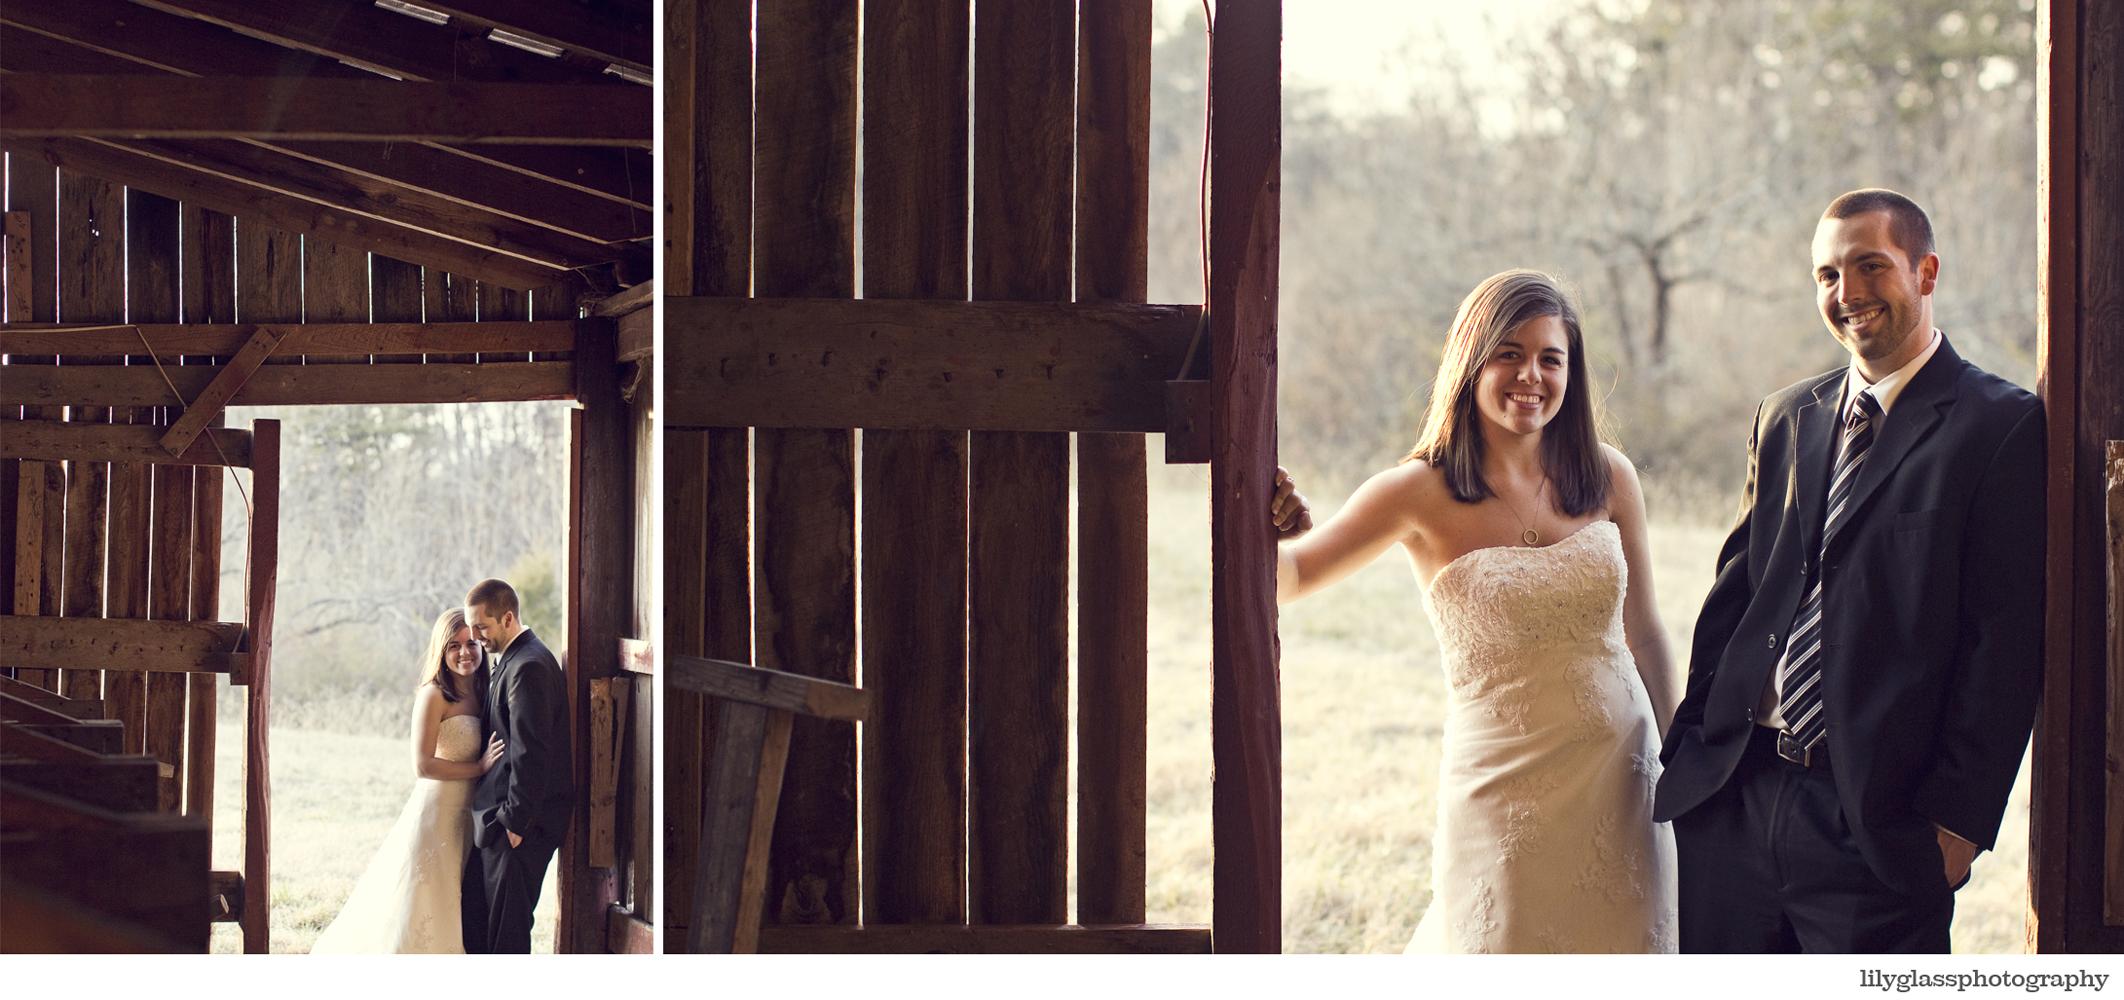 LilyGlassPhotography_JessicaBrandon